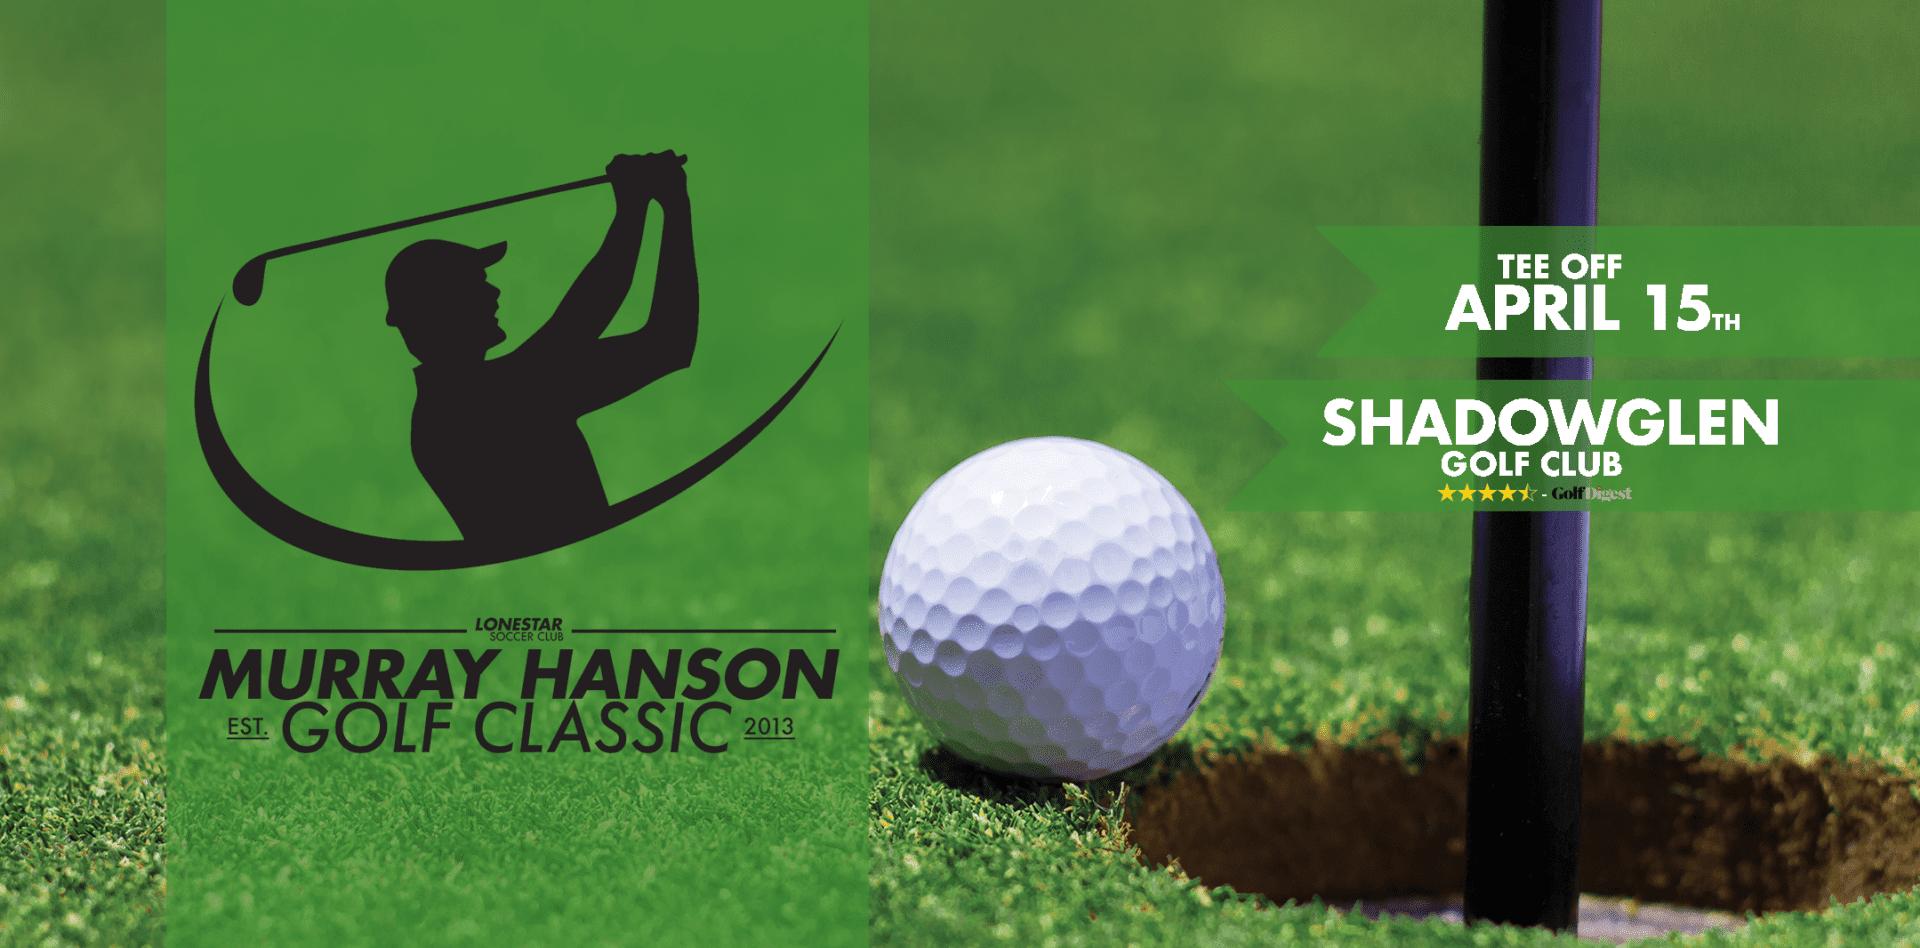 Murray Hanson Golf Classic